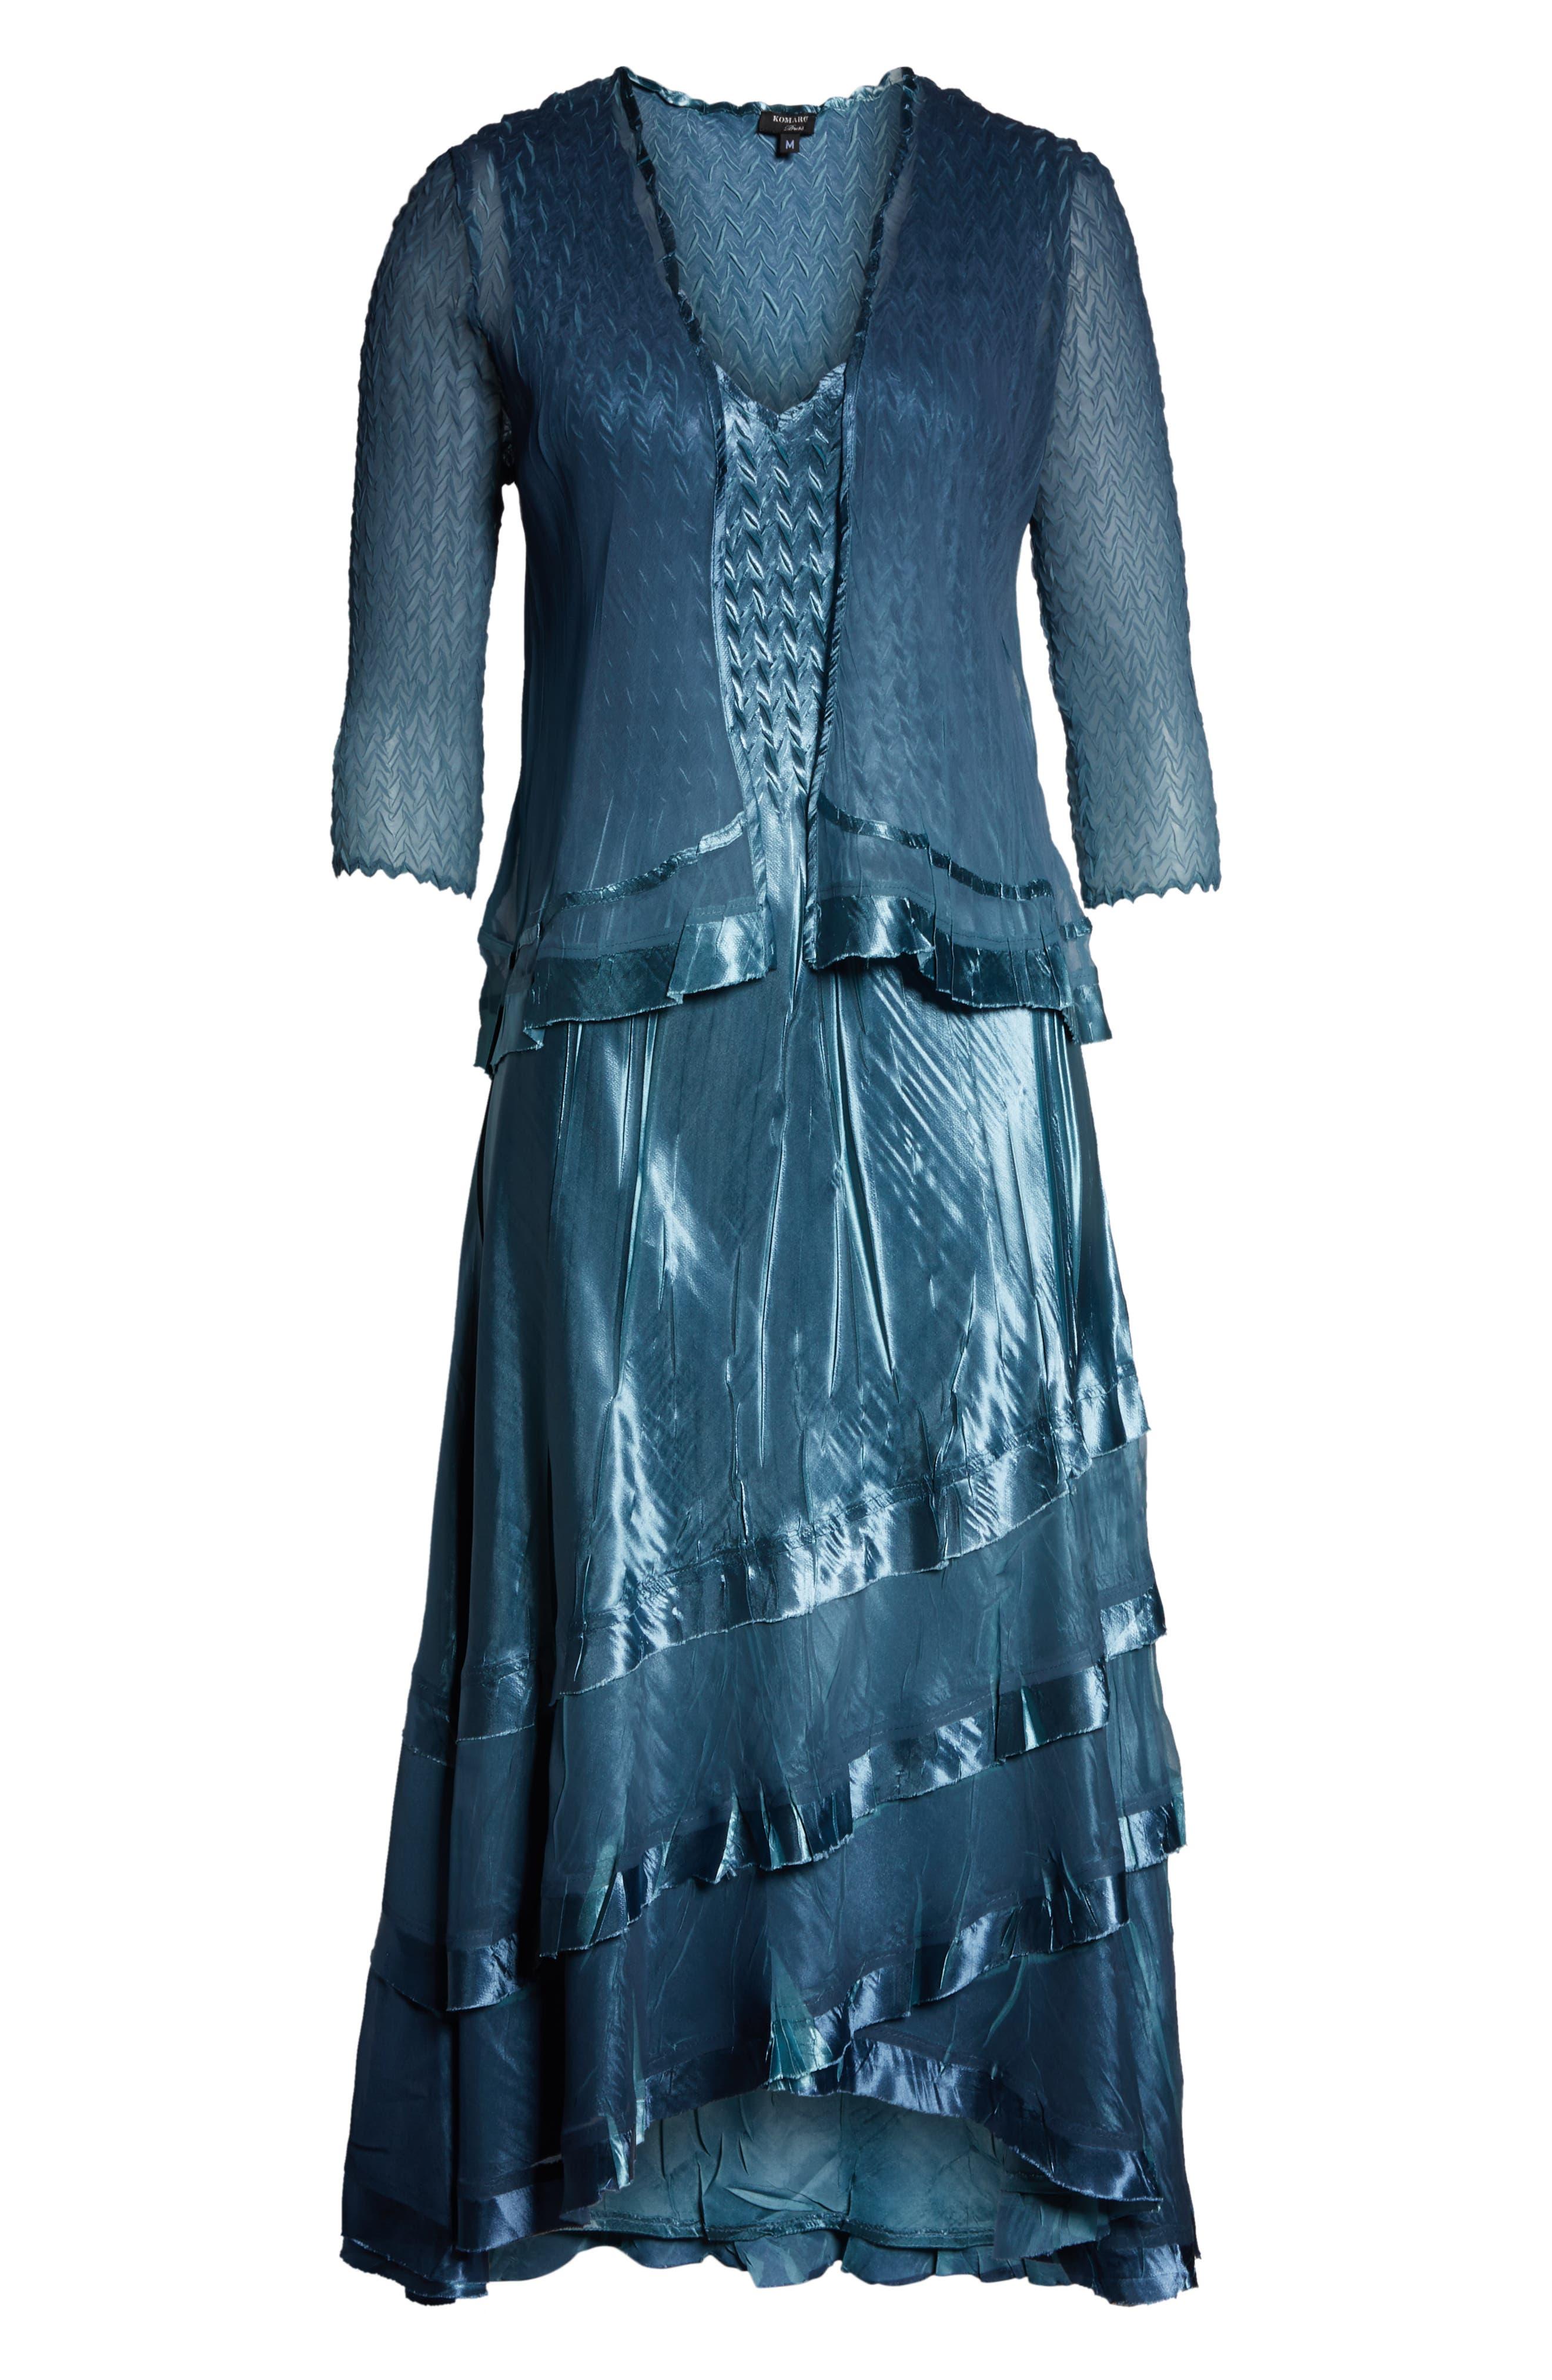 KOMAROV, Asymmetrical Jacket Dress, Alternate thumbnail 6, color, SILVER BLUE NIGHT OMBRE